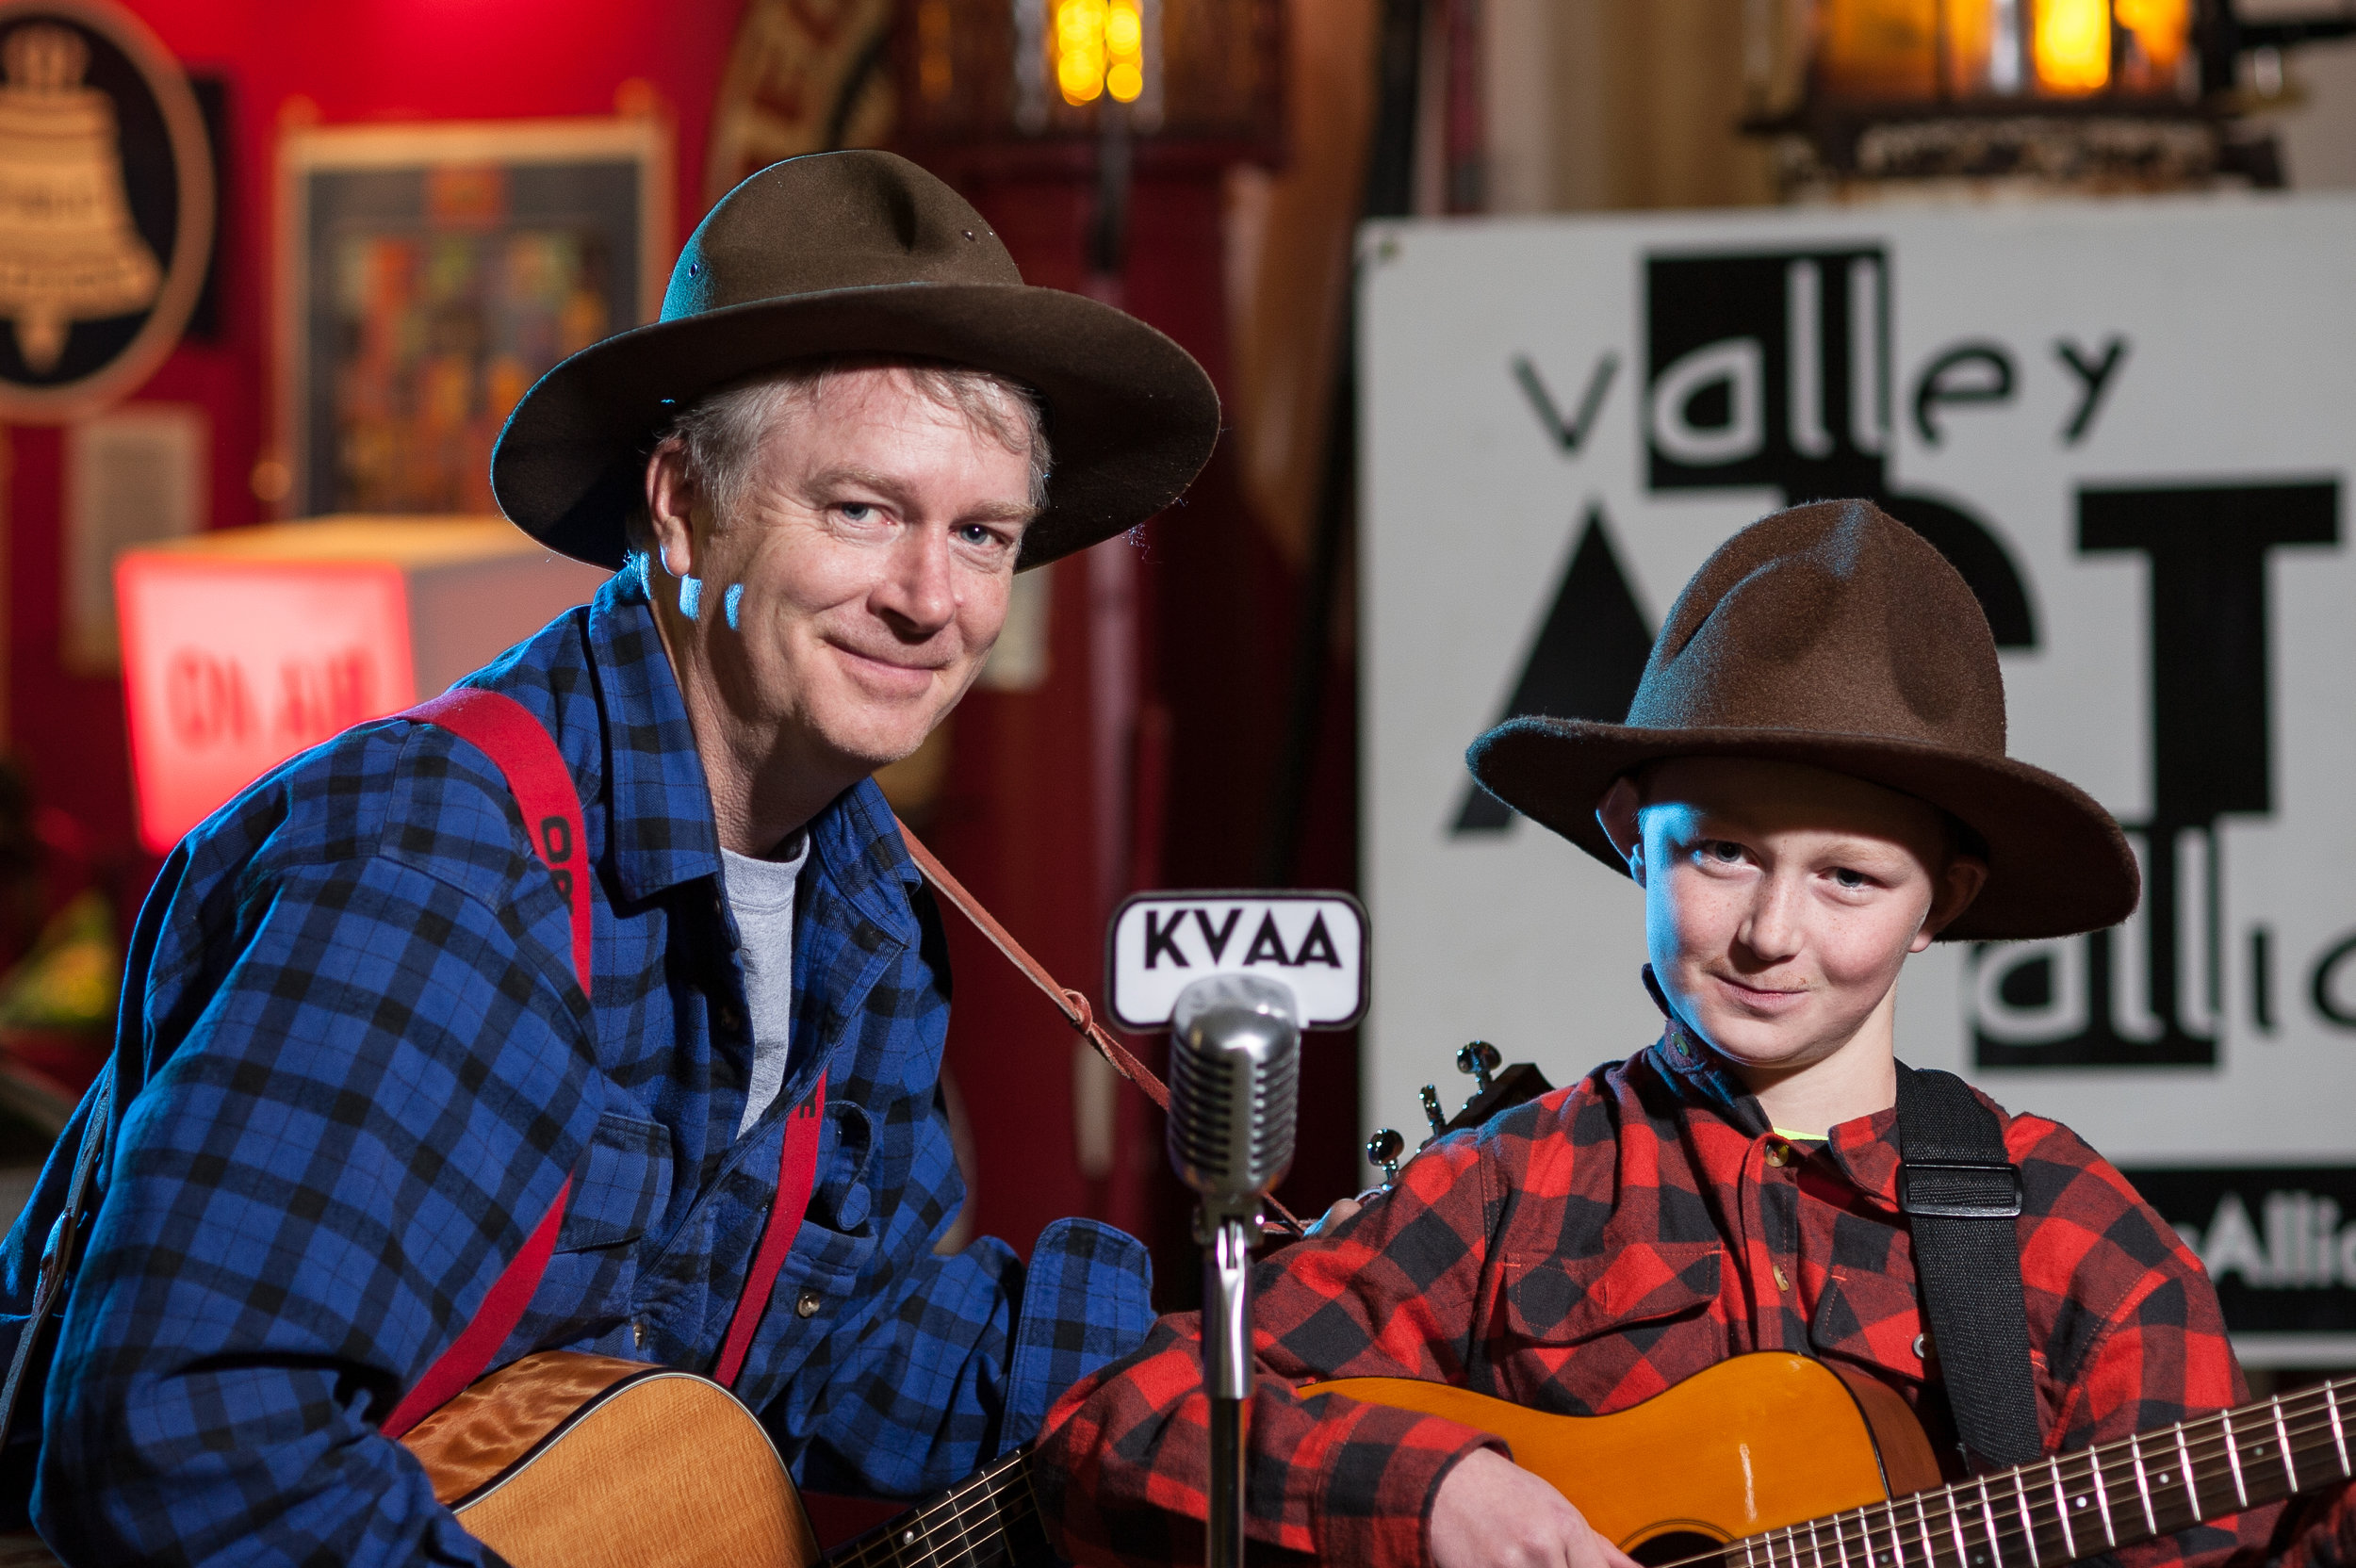 Valley Arts Alliance